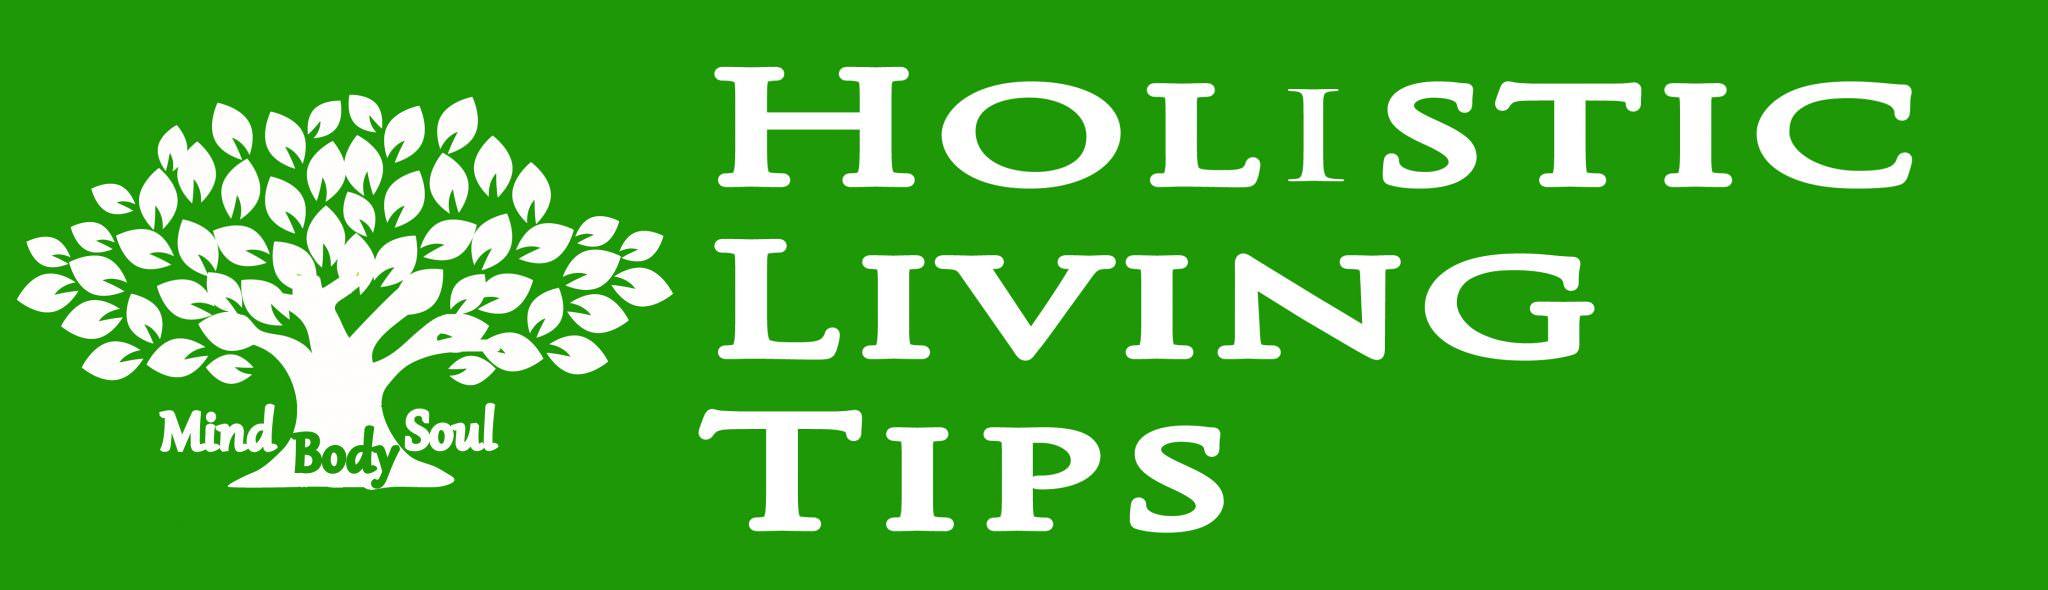 Holistic Living Tips